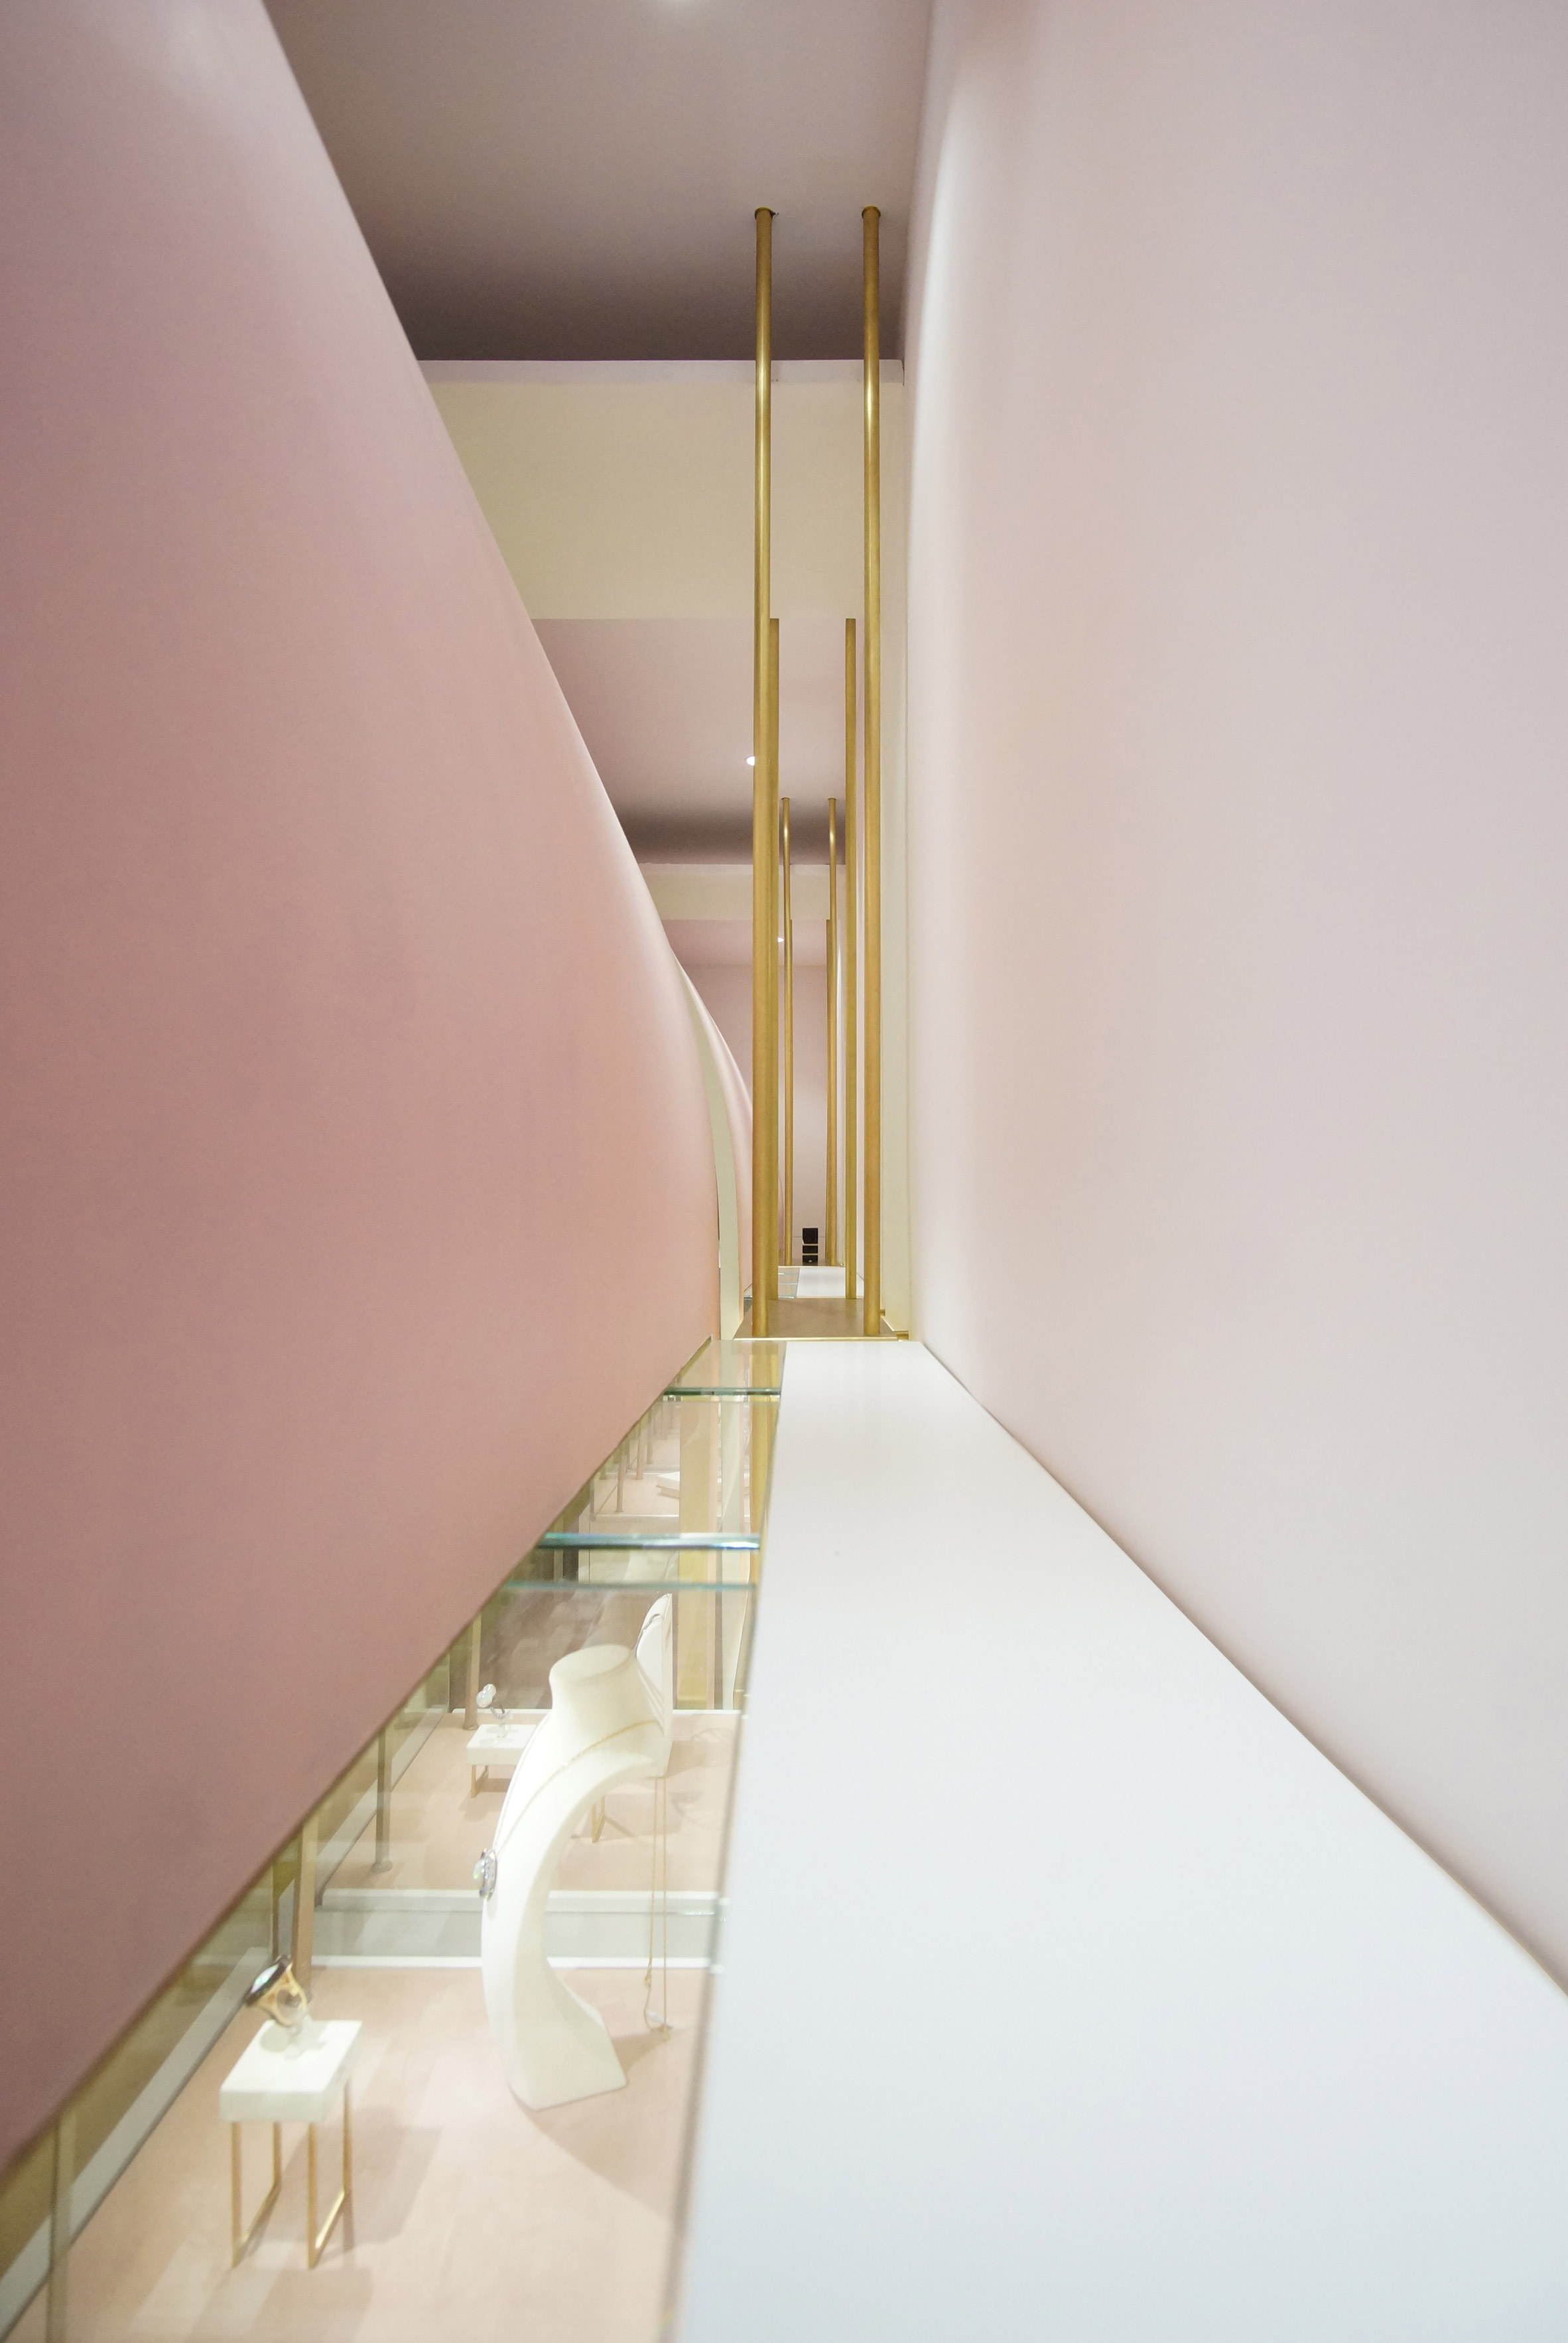 nuun-jewellery-shop-java-architectes-interiors-retail-paris-france_dezeen_2364_col_3.jpg